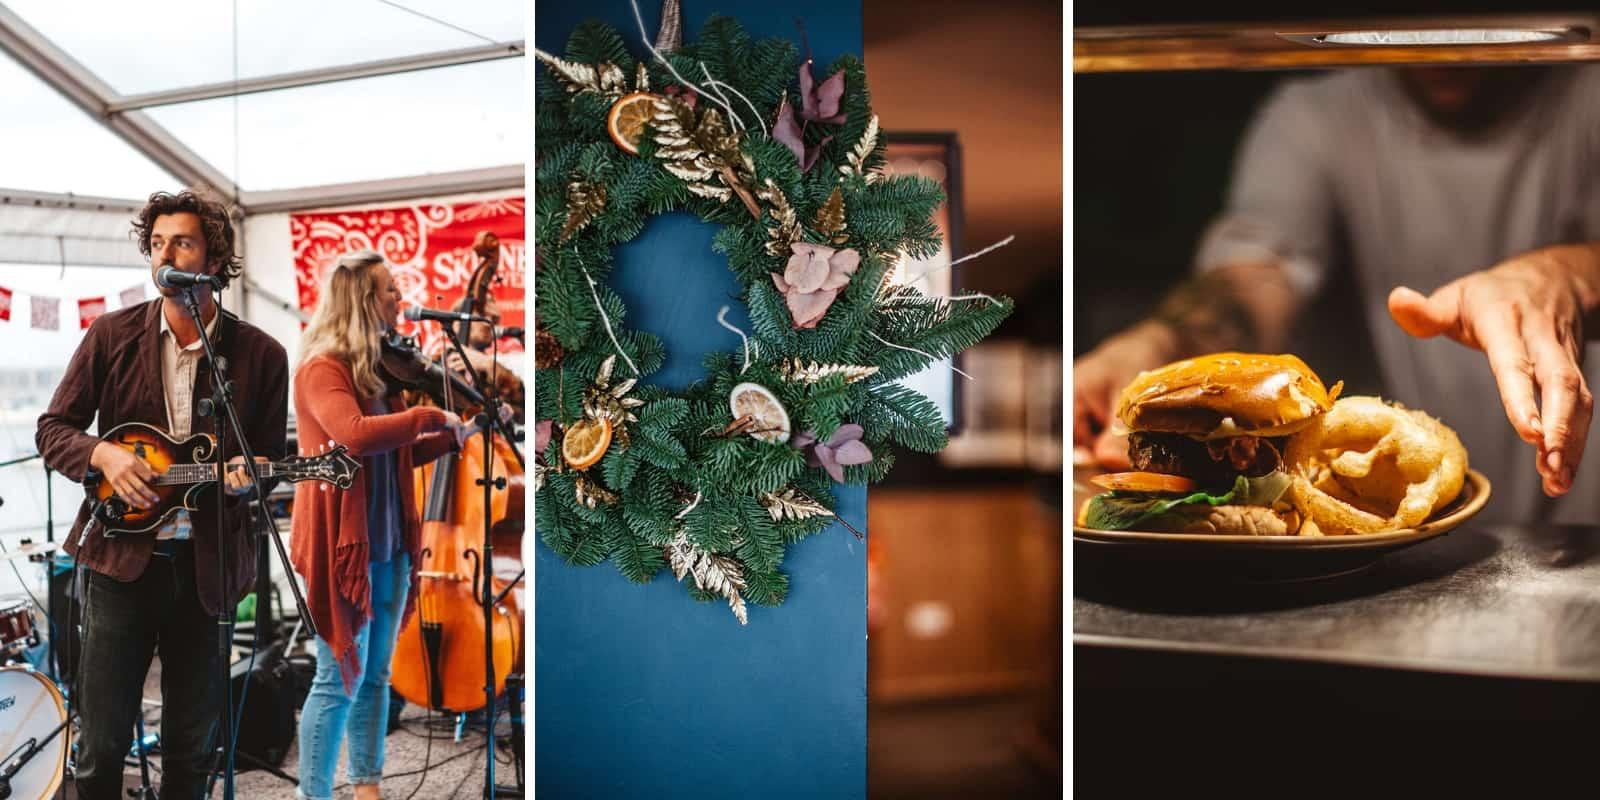 christmas festival-in-falmouth-the-working-boat-pub-mini-christmas-festival-5